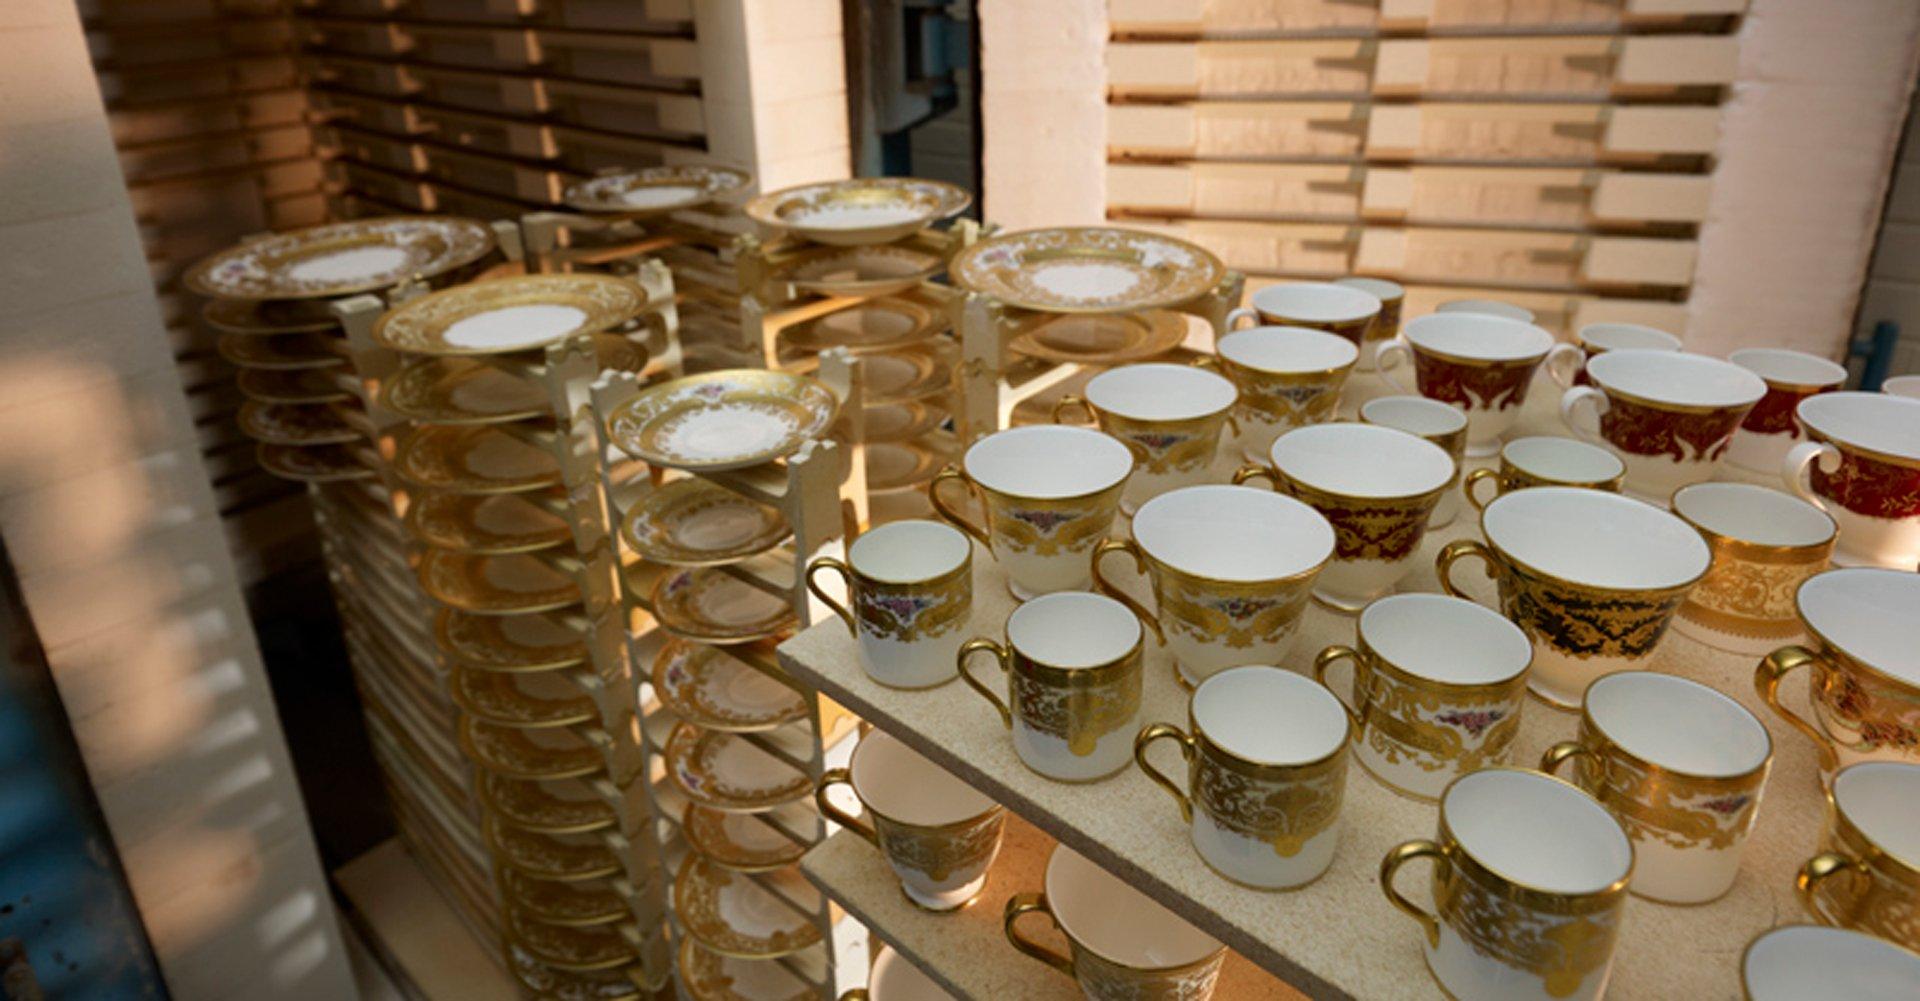 LyntonFBC-Luxury-Exclusive-Tableware-Fine-Bone-China-Pride